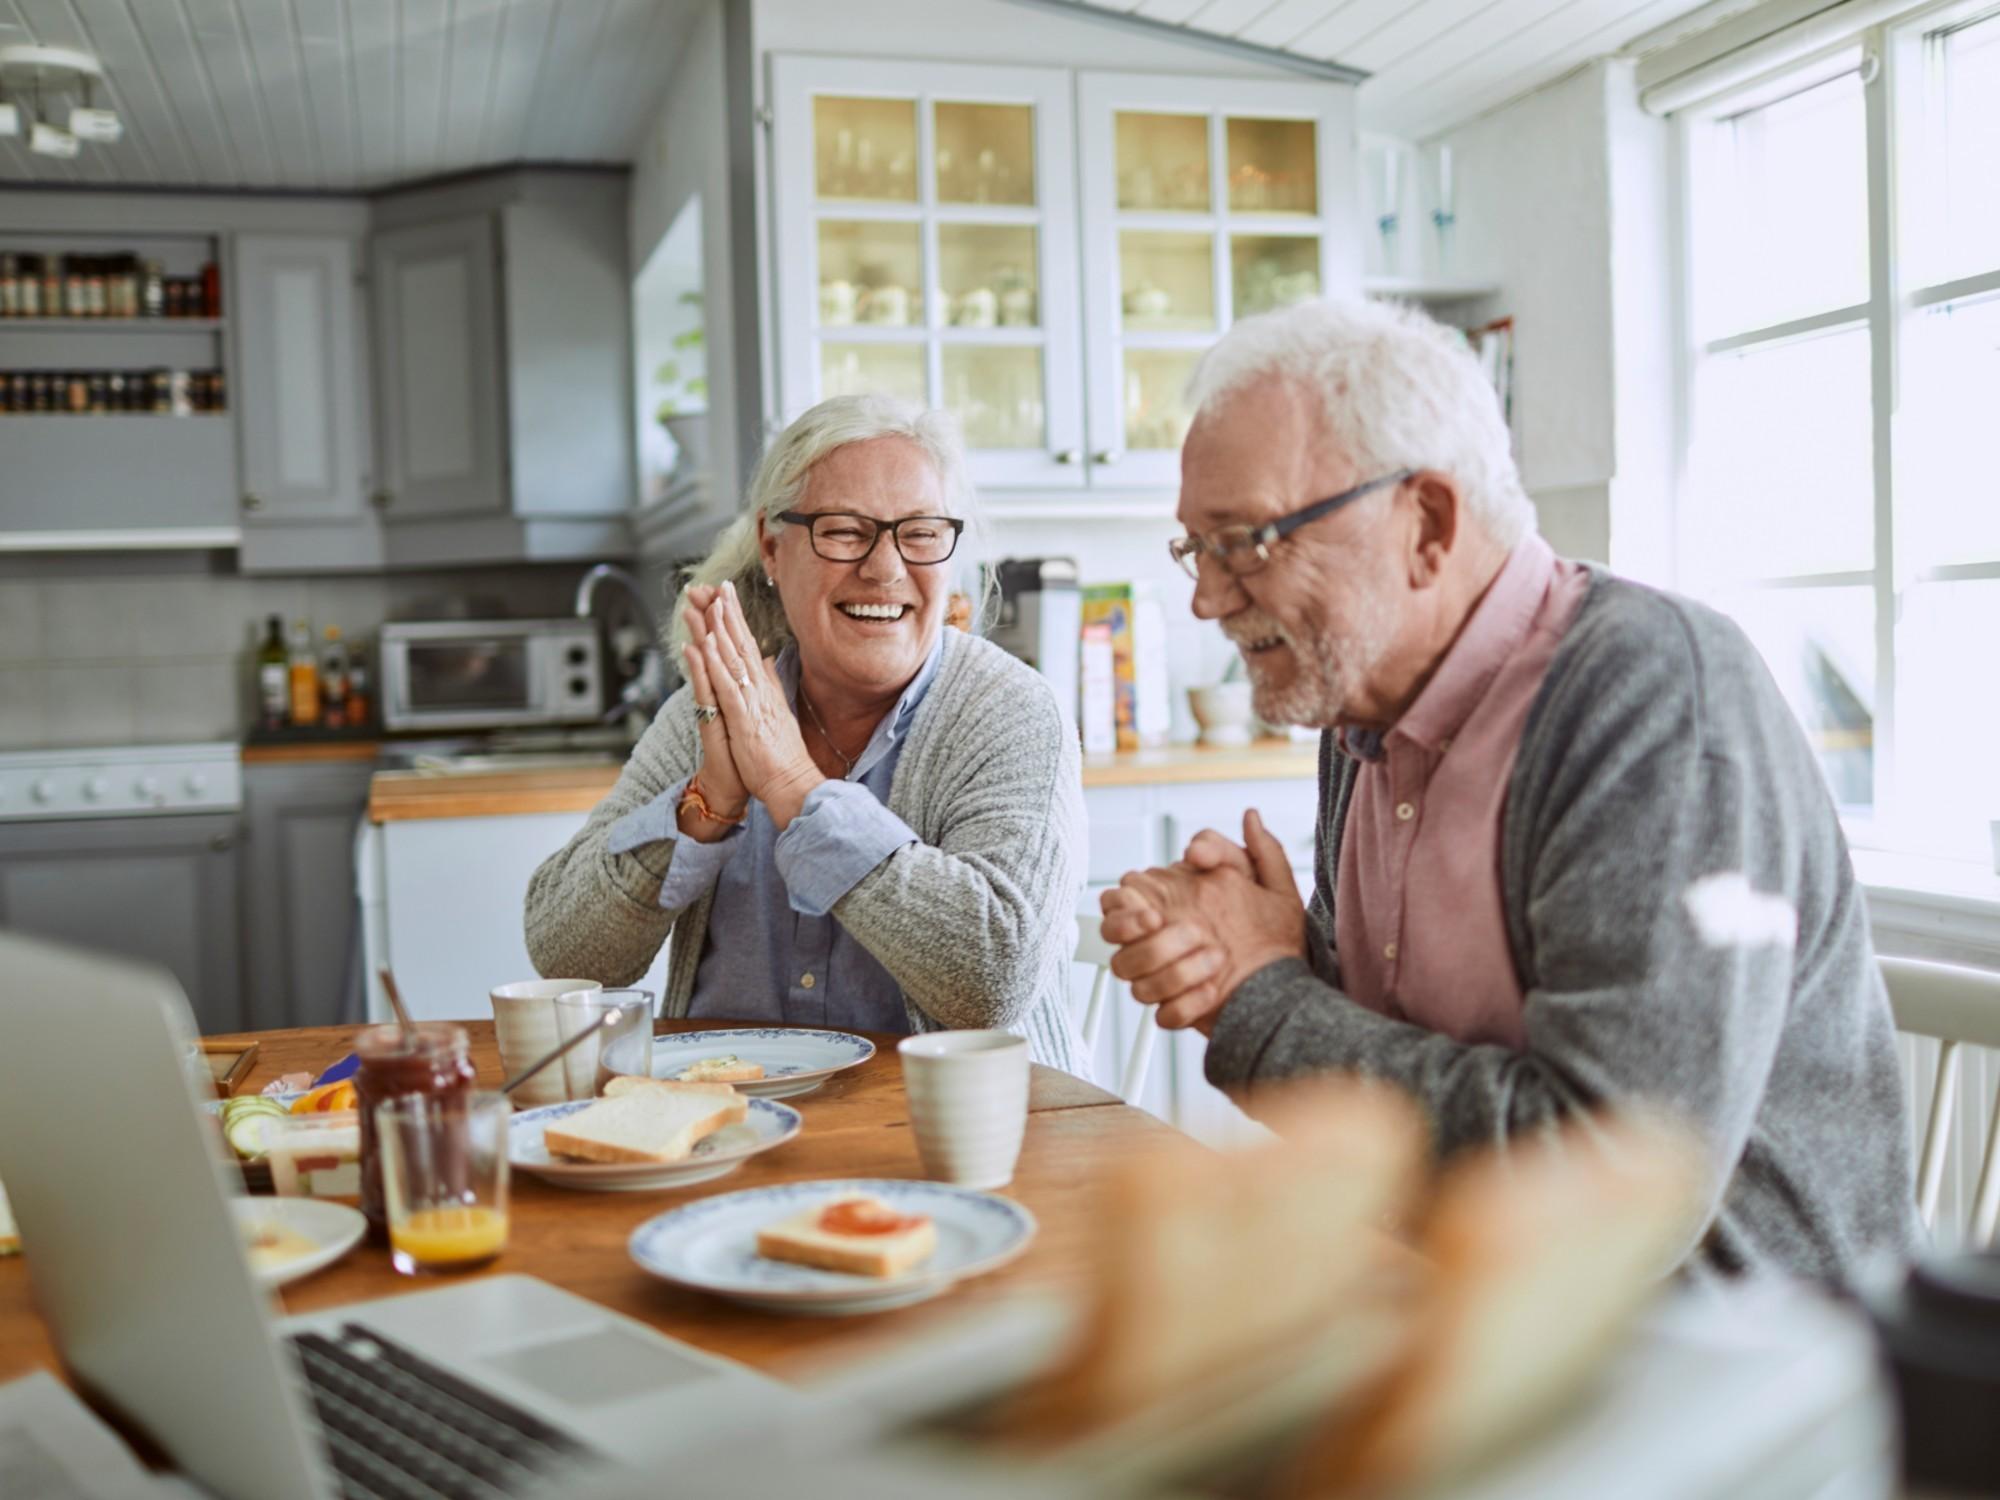 Elderly couple enjoying food at the table